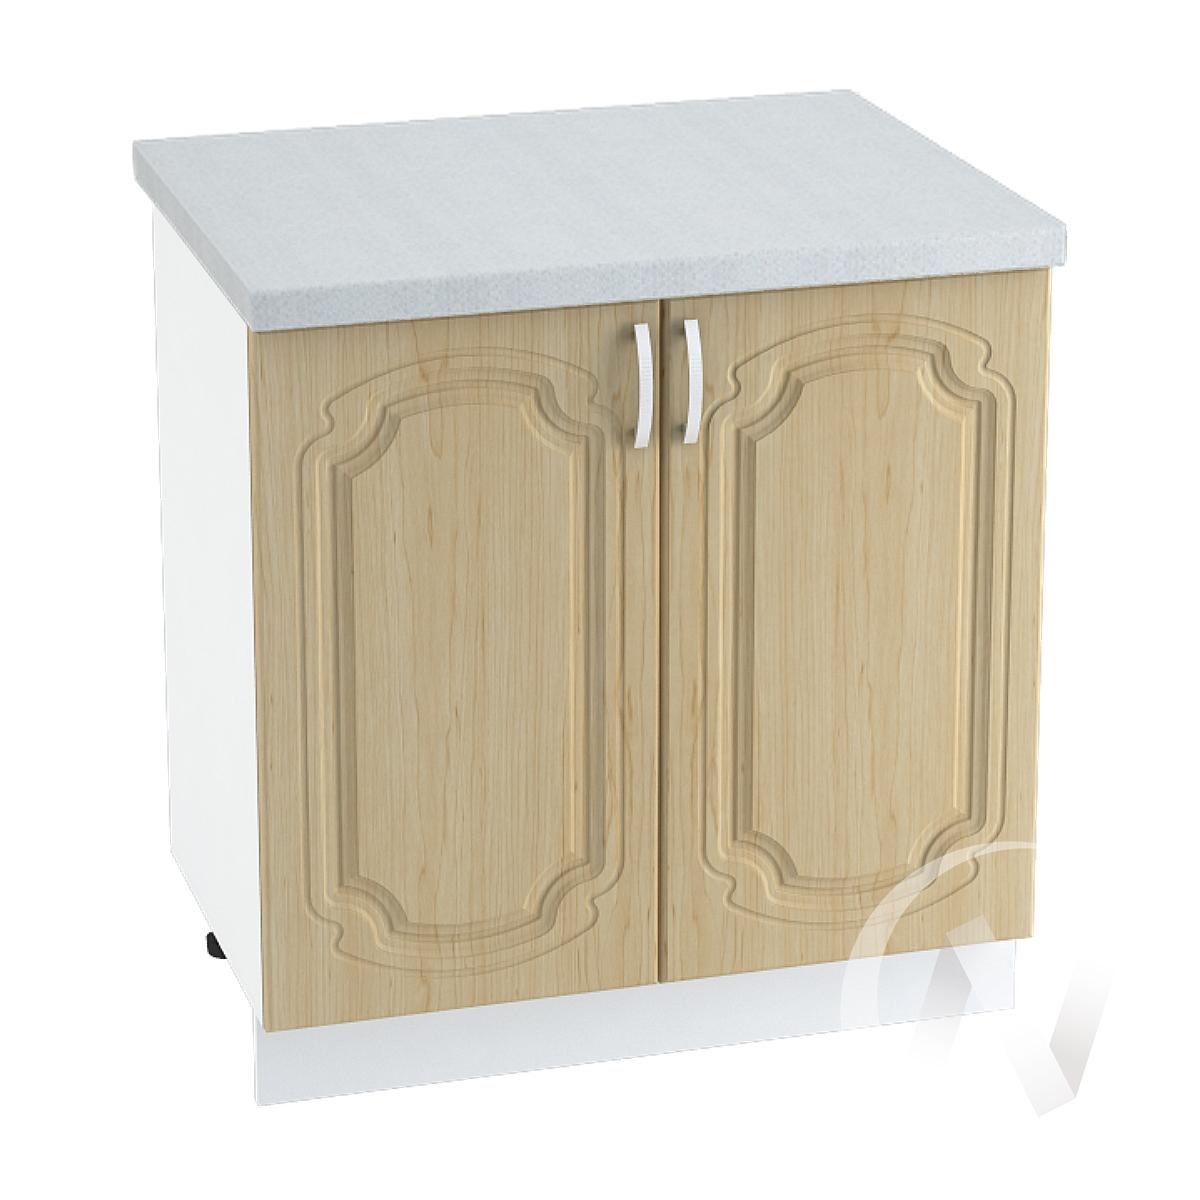 "Кухня ""Настя"": Шкаф нижний 800, ШН 800 новый (Береза/корпус белый)"